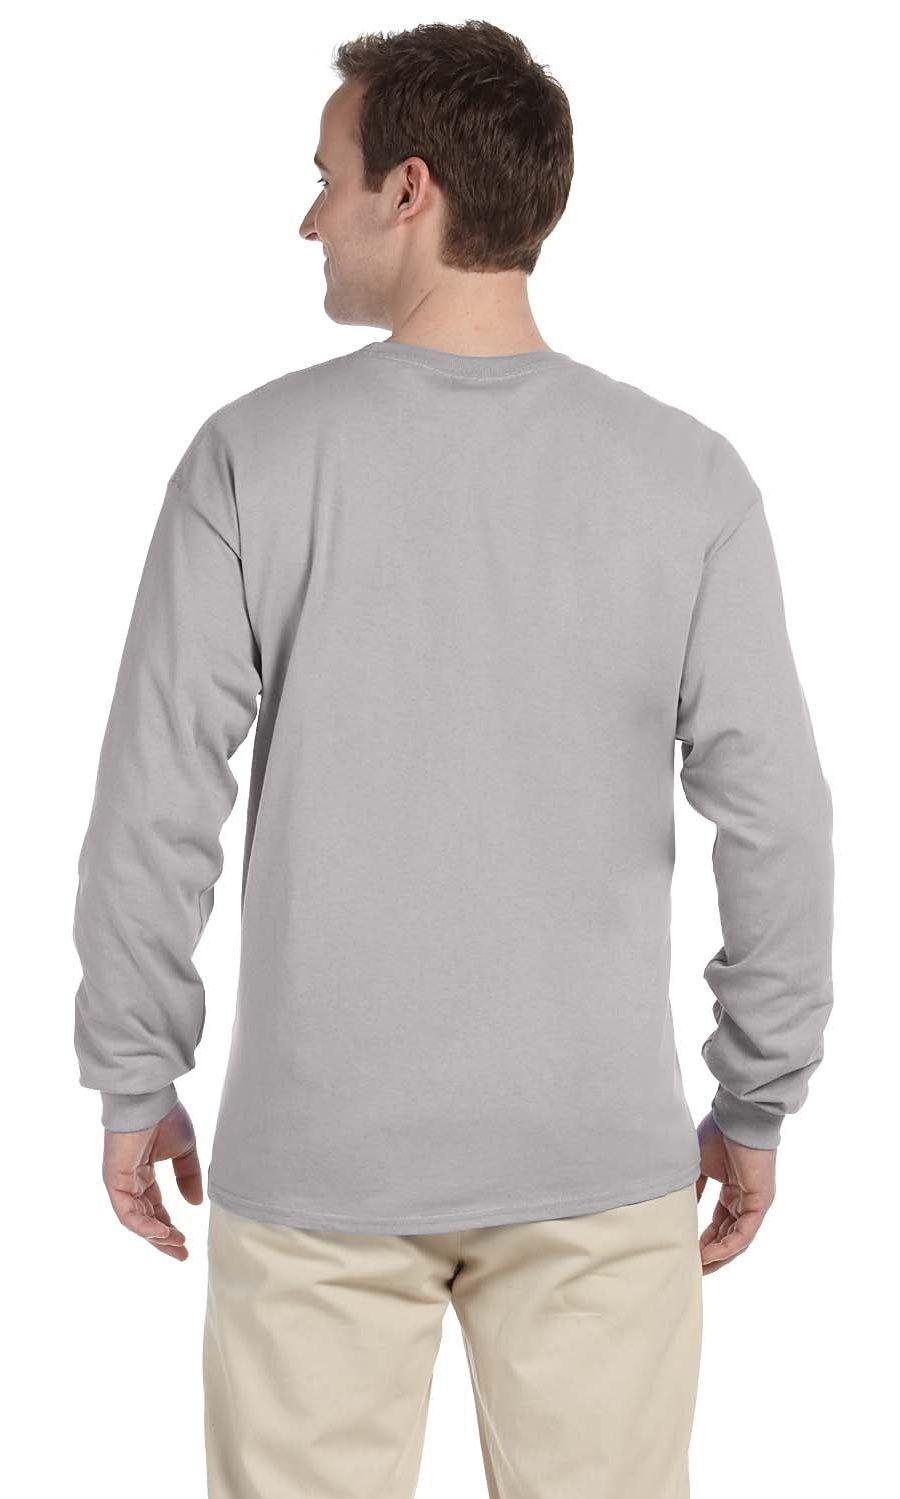 203758fc Fruit of the Loom T-Shirts - Long Sleeve HD Cotton Long Sleeve T-Shirt# Shirts, #Long, #Fruit